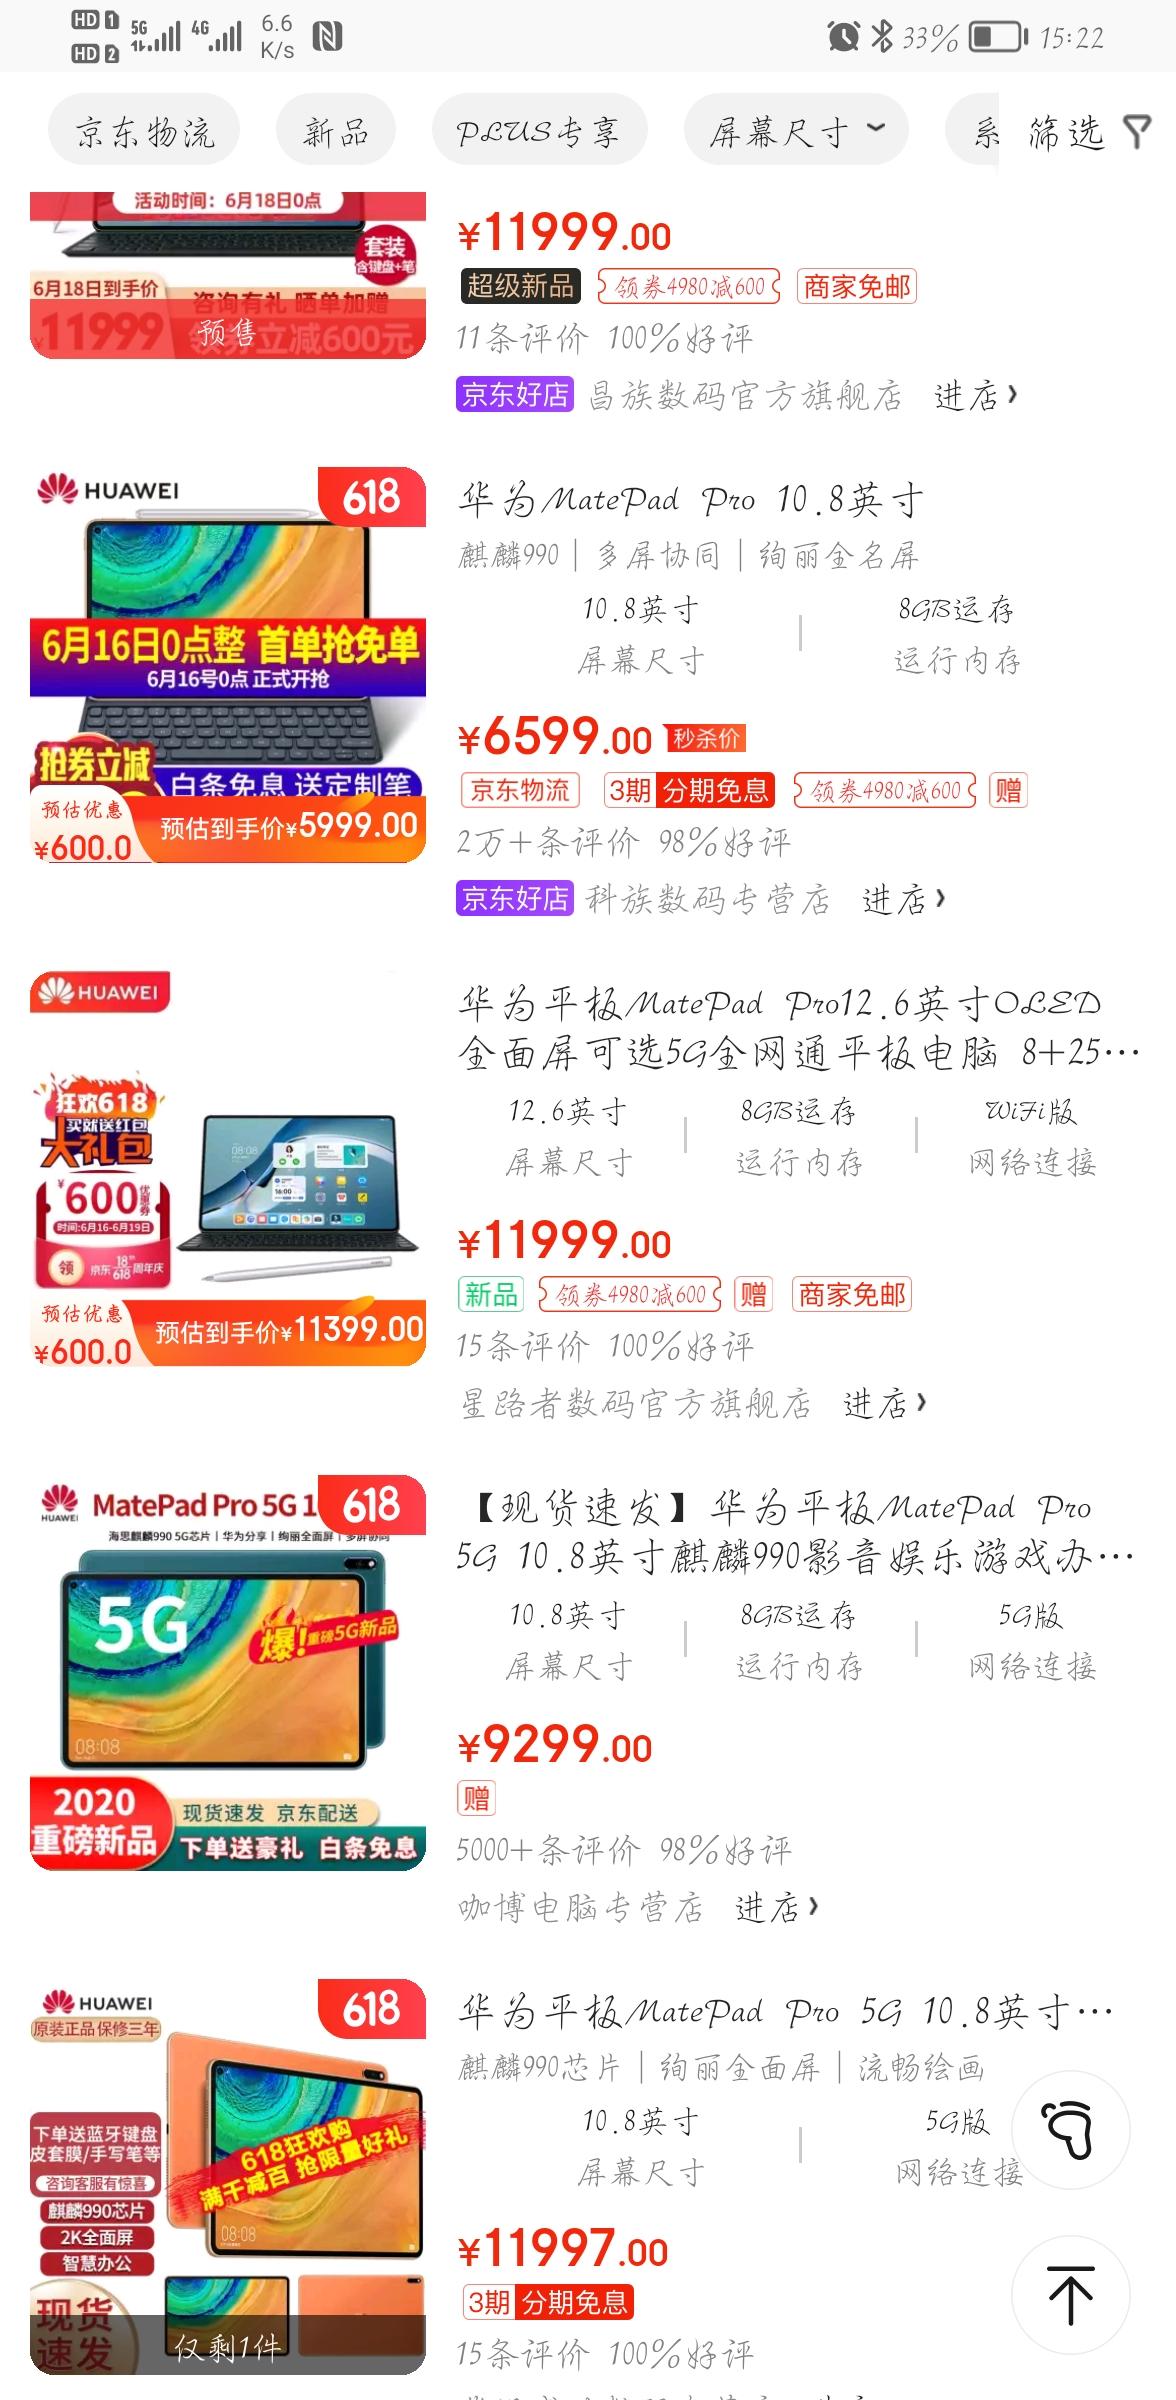 Screenshot_20210617_152249_com.jingdong.app.mall.jpg